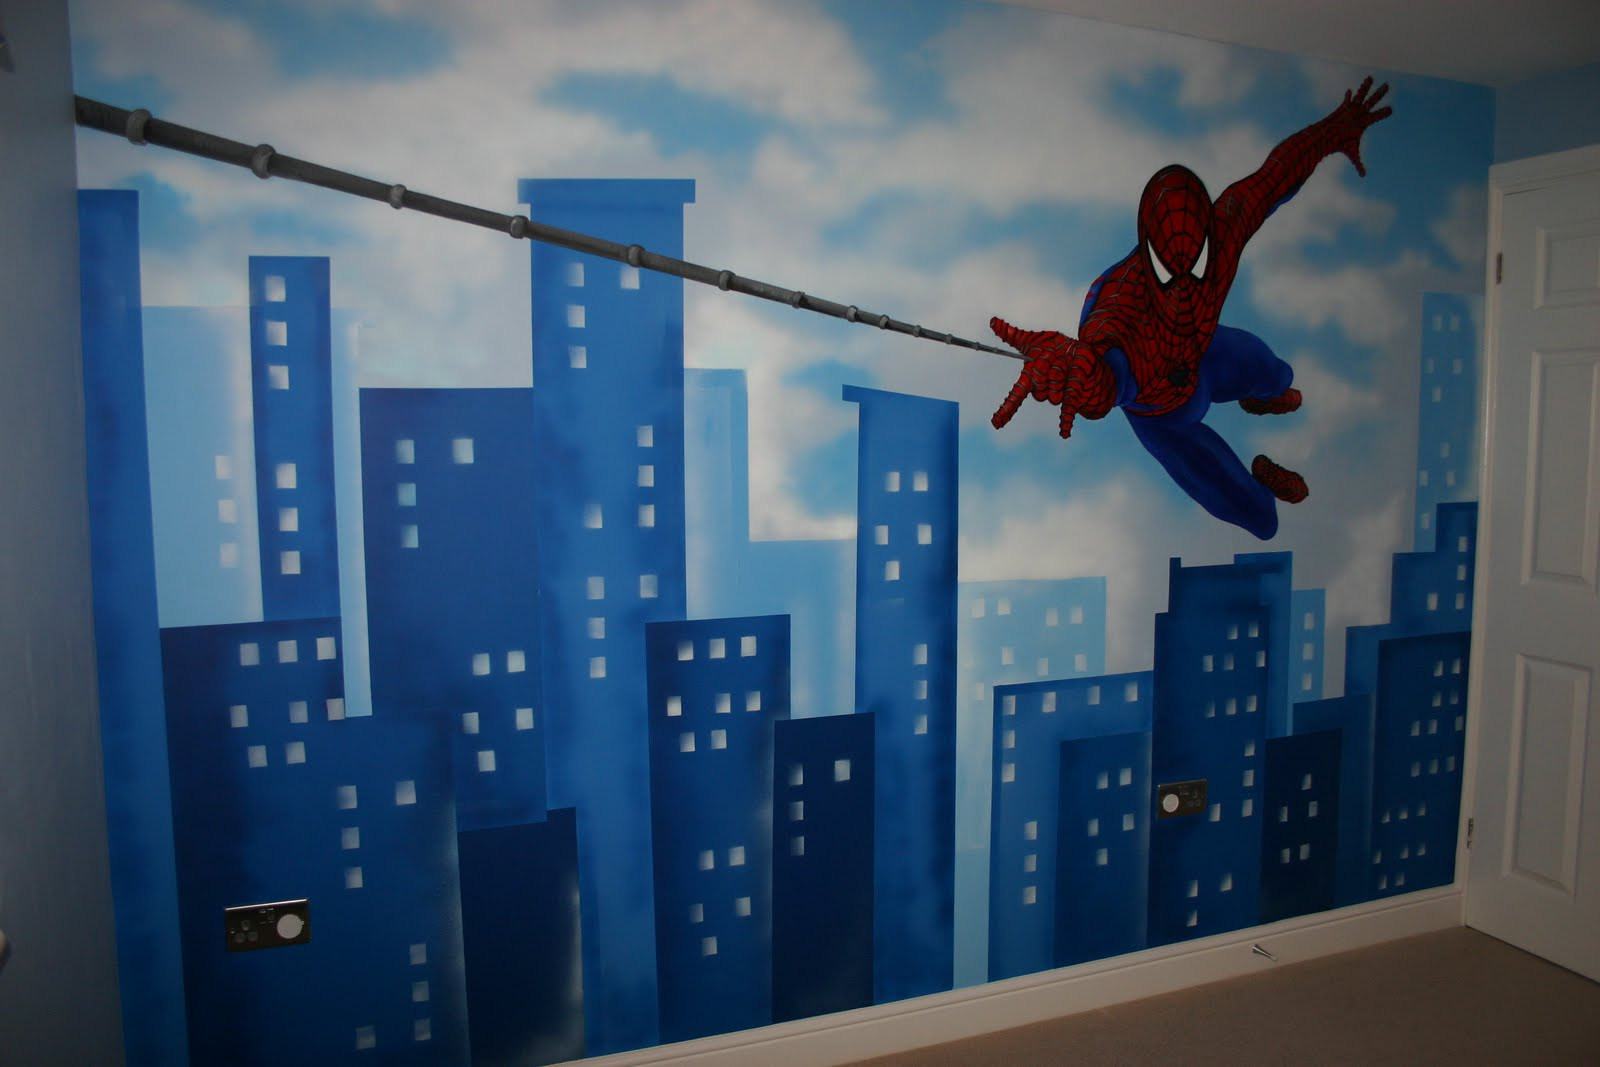 Mural Designs Quot The Muralist Quot Spiderman Wall Mural